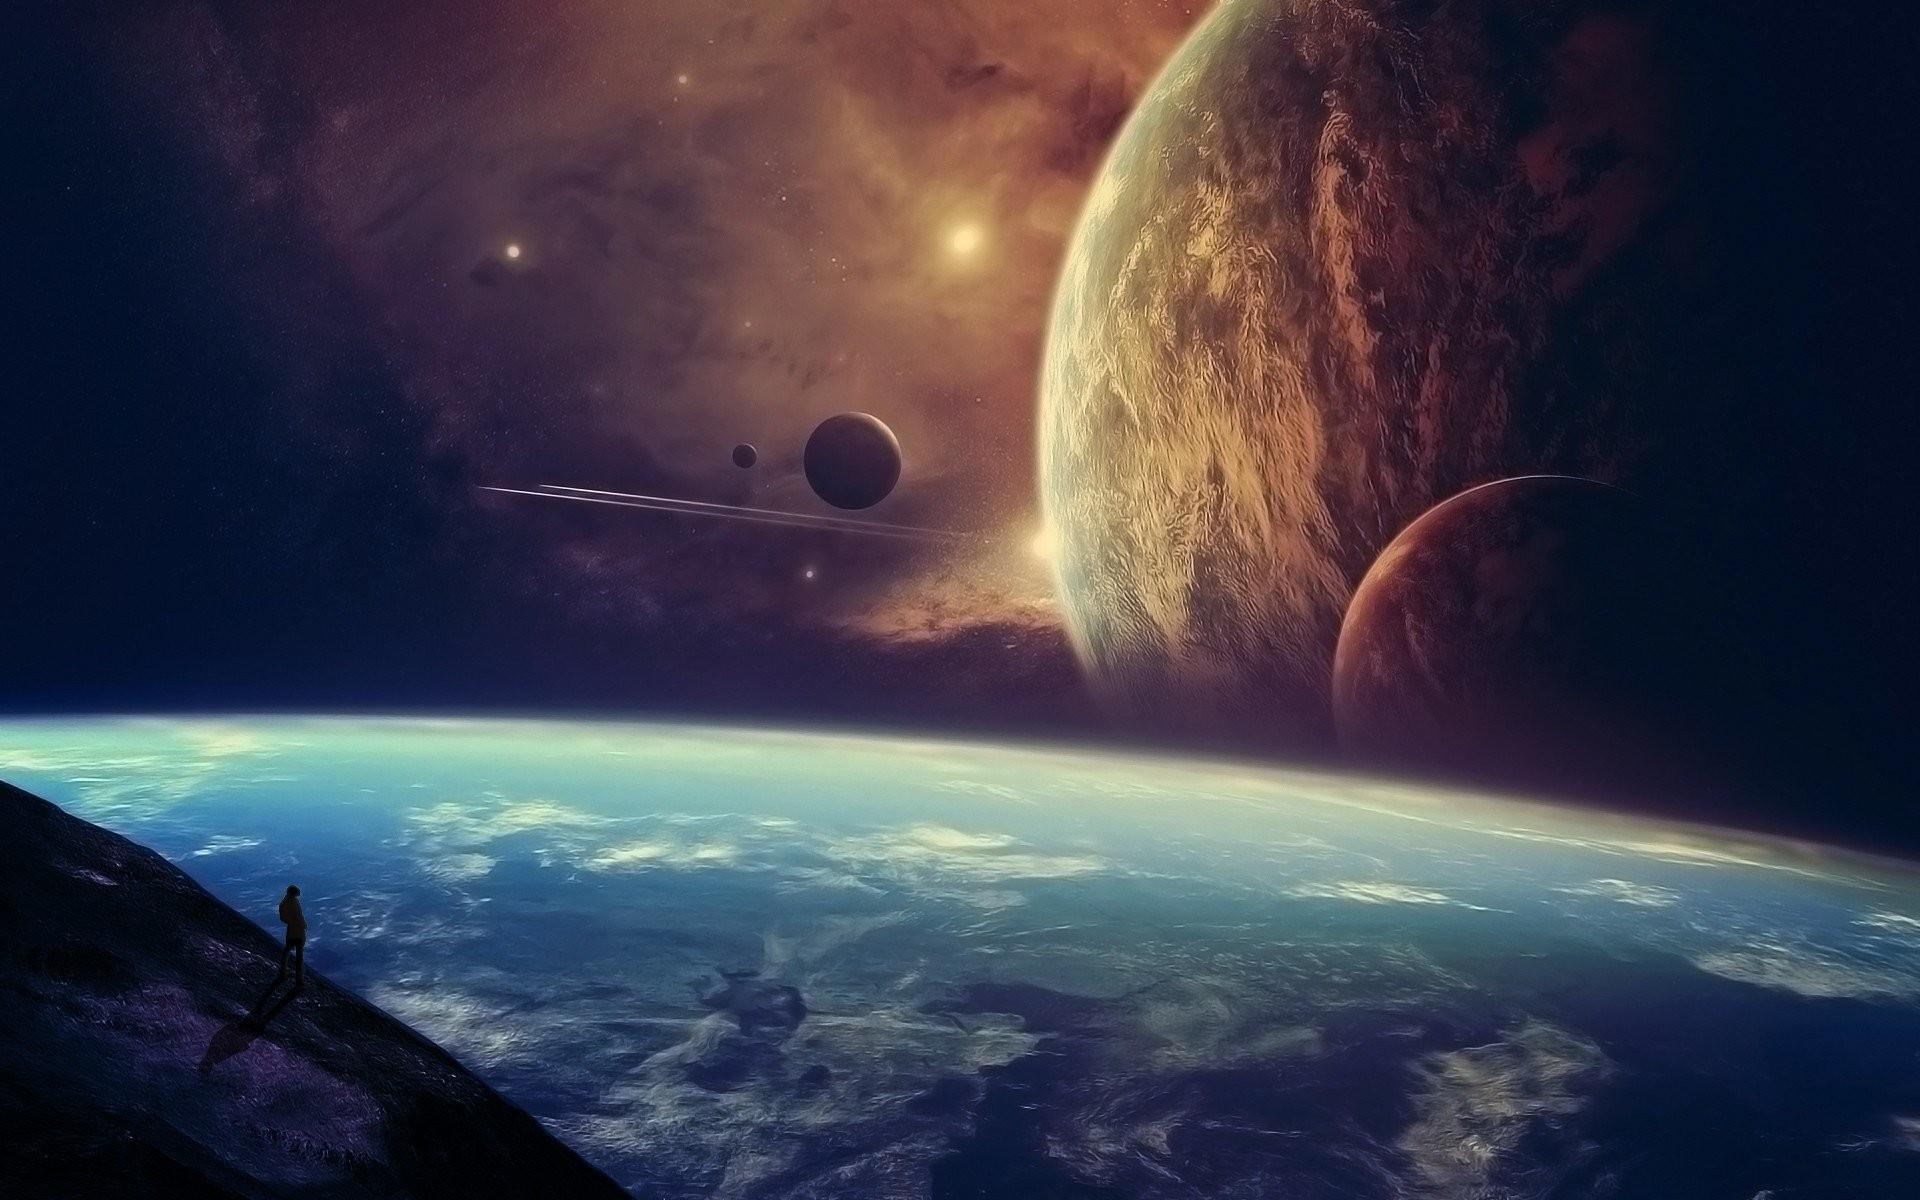 Fantasy Planets Space Spaceship Wallpaper